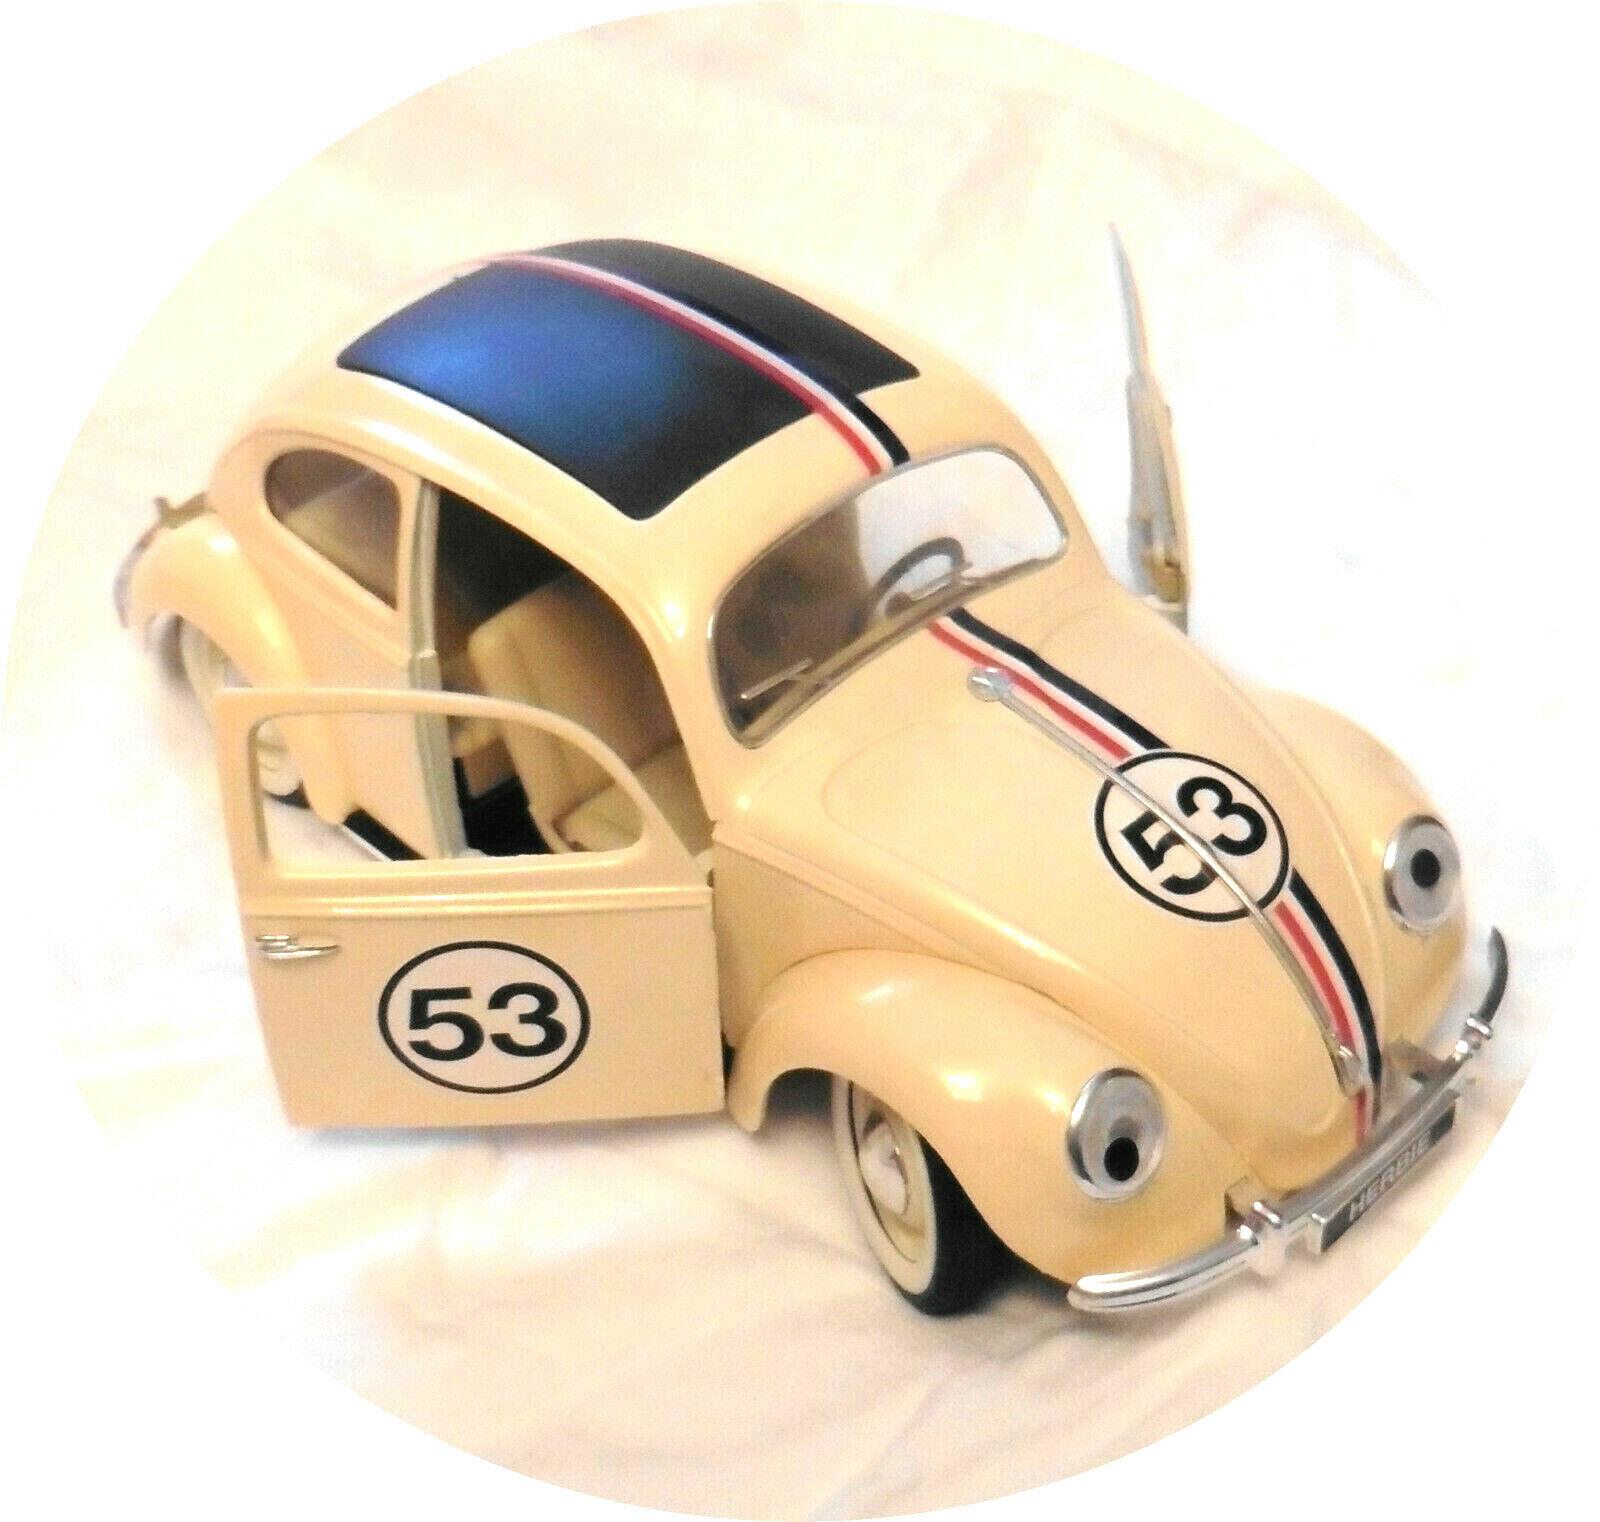 SOLIDO Volkswagen Käfer als HERBIE, Maßstab ca. 1 17, (fast) neuwertig